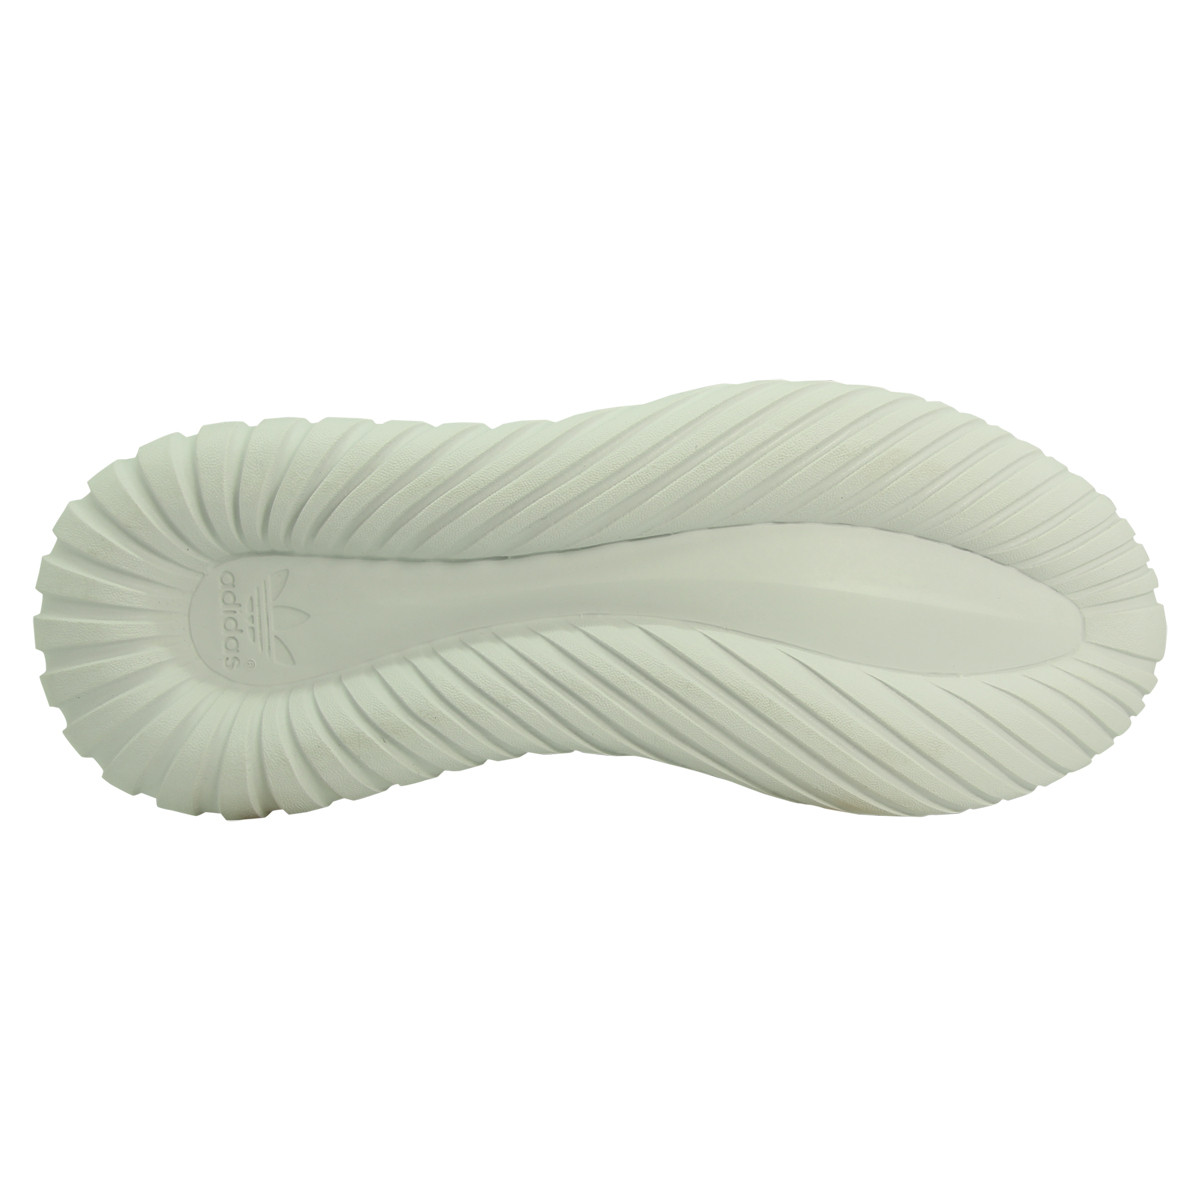 Adidas Originales Primeknit Tubular Nova Primeknit Originales Hombre Tenis Zapatos 4b0e16